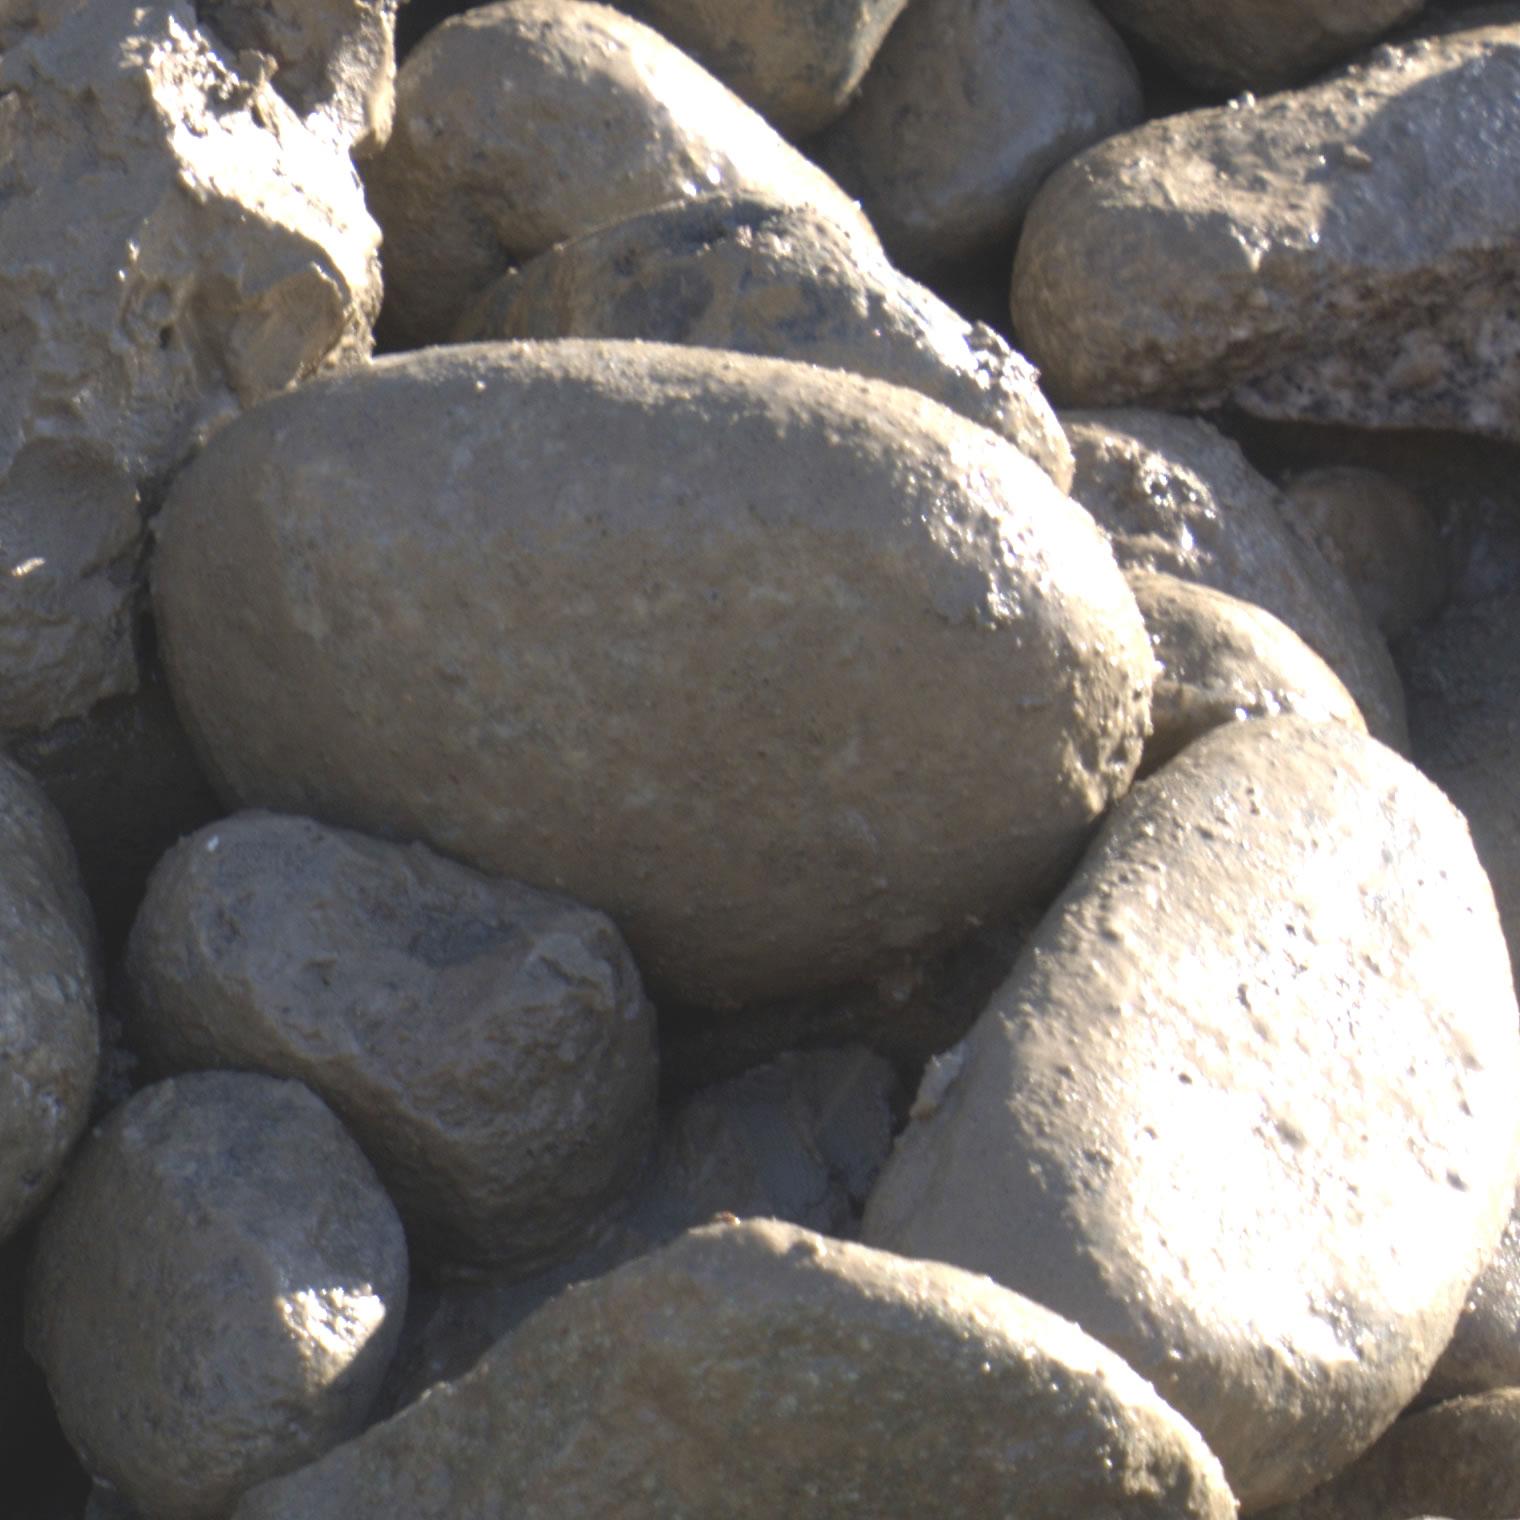 Overs & Boulders